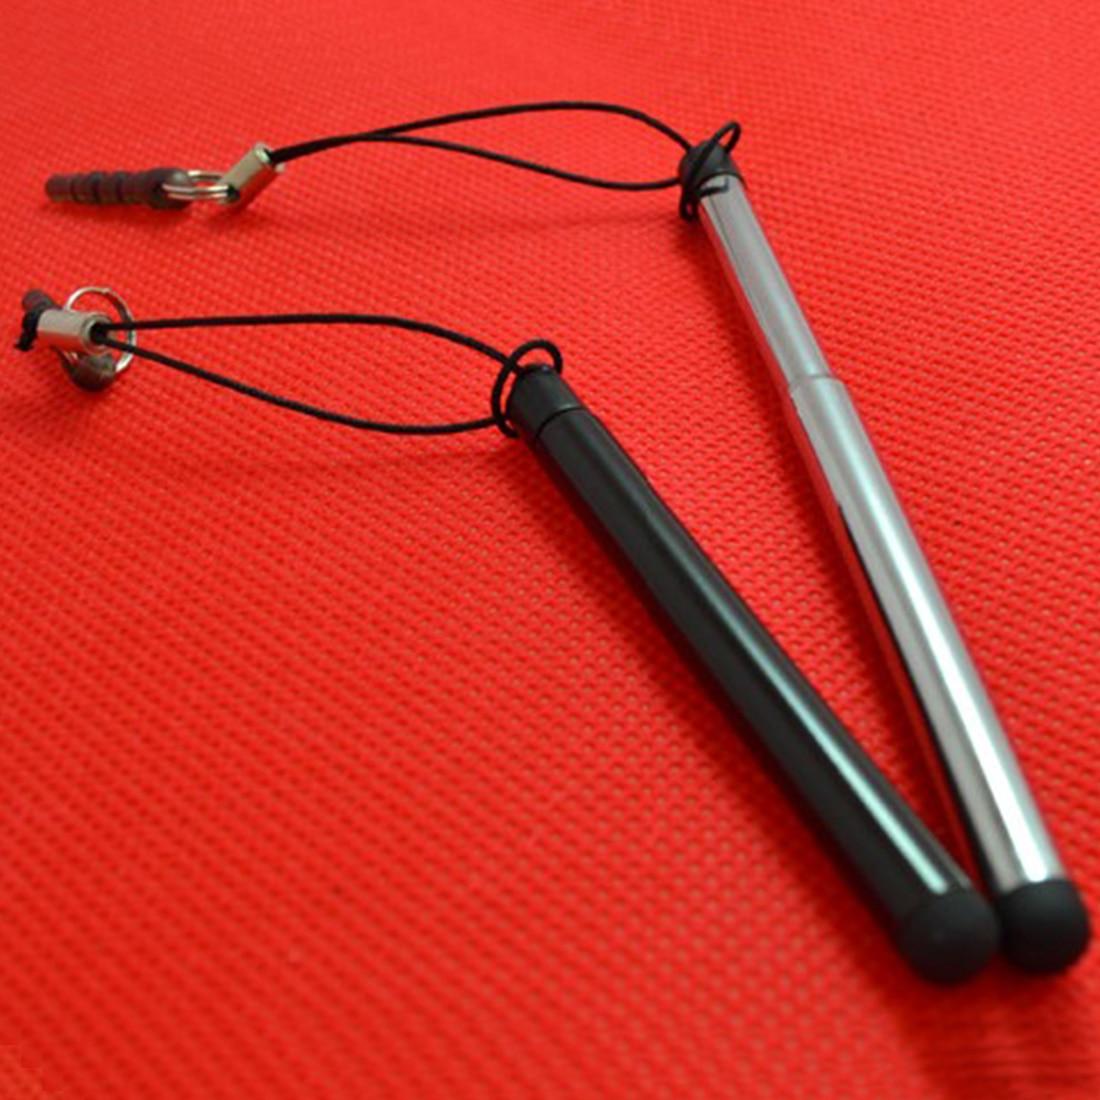 Touch Screen Pen Scalable Fine Head High-precision Handwritten Capacitance Pen Stylus Pen